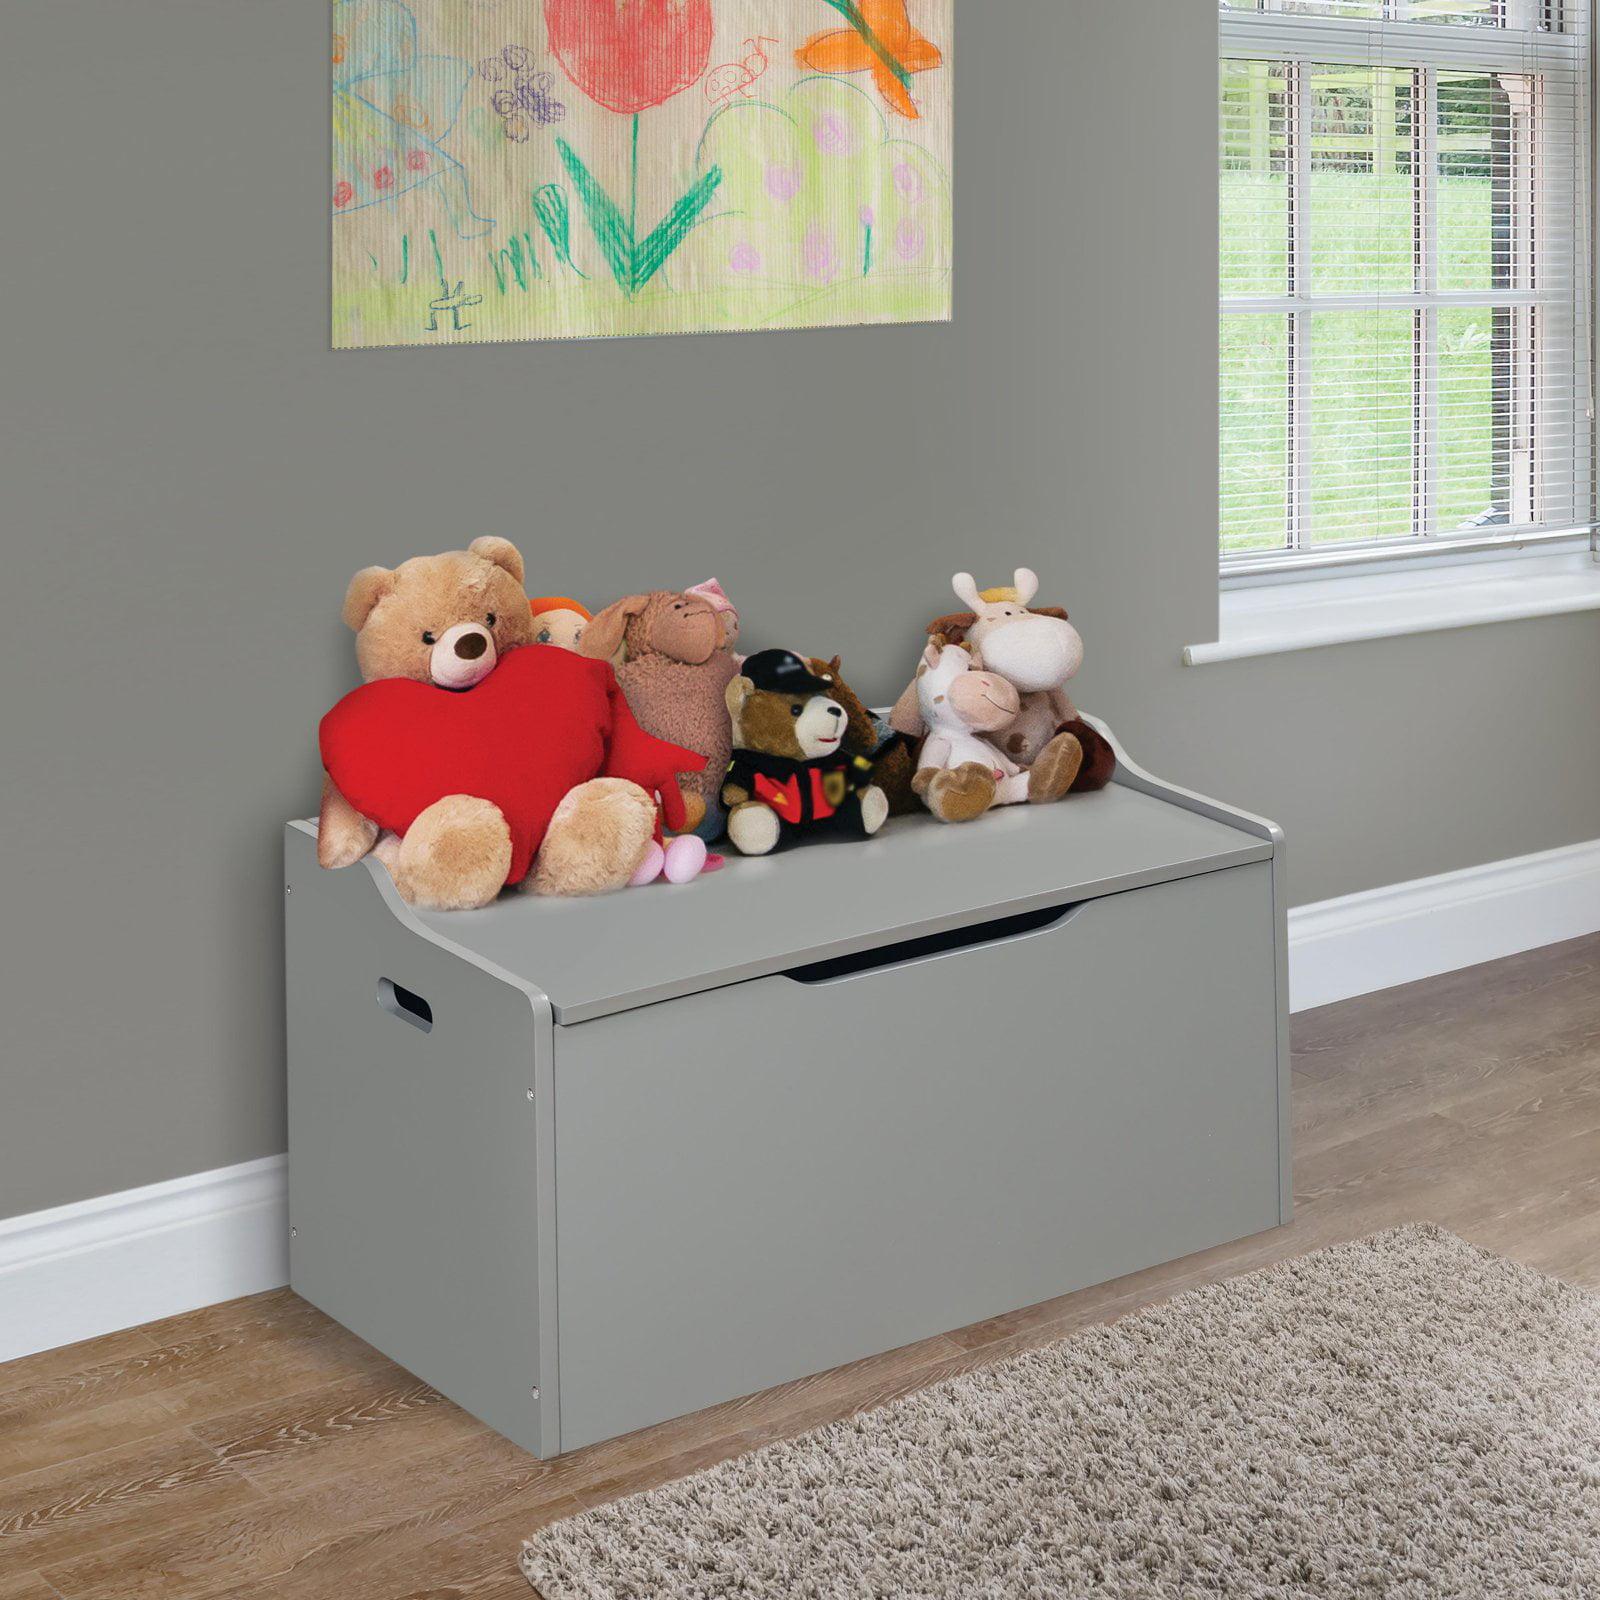 Badger Basket Kid's Wooden Toy Box